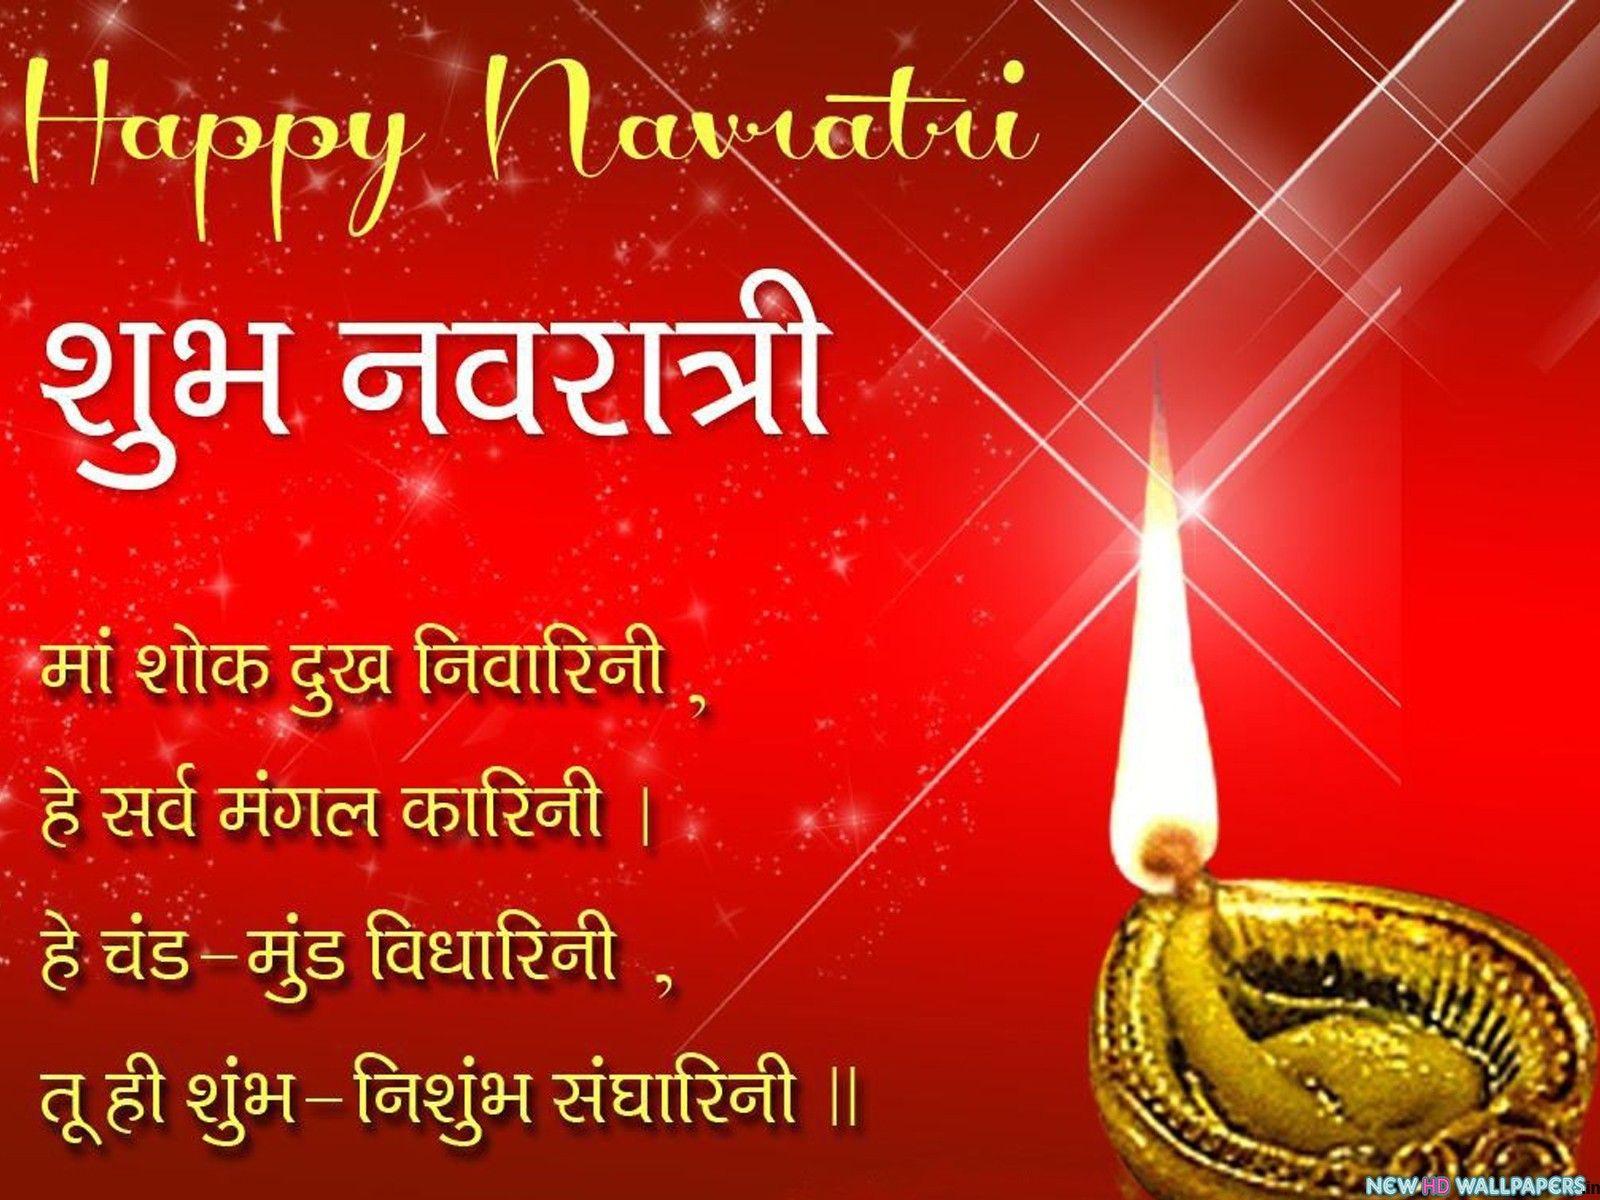 Wishing all members of astroaditya happy navratri may maa happy navratri wishes navaratri best thoughts navaratri quotes kristyandbryce Choice Image